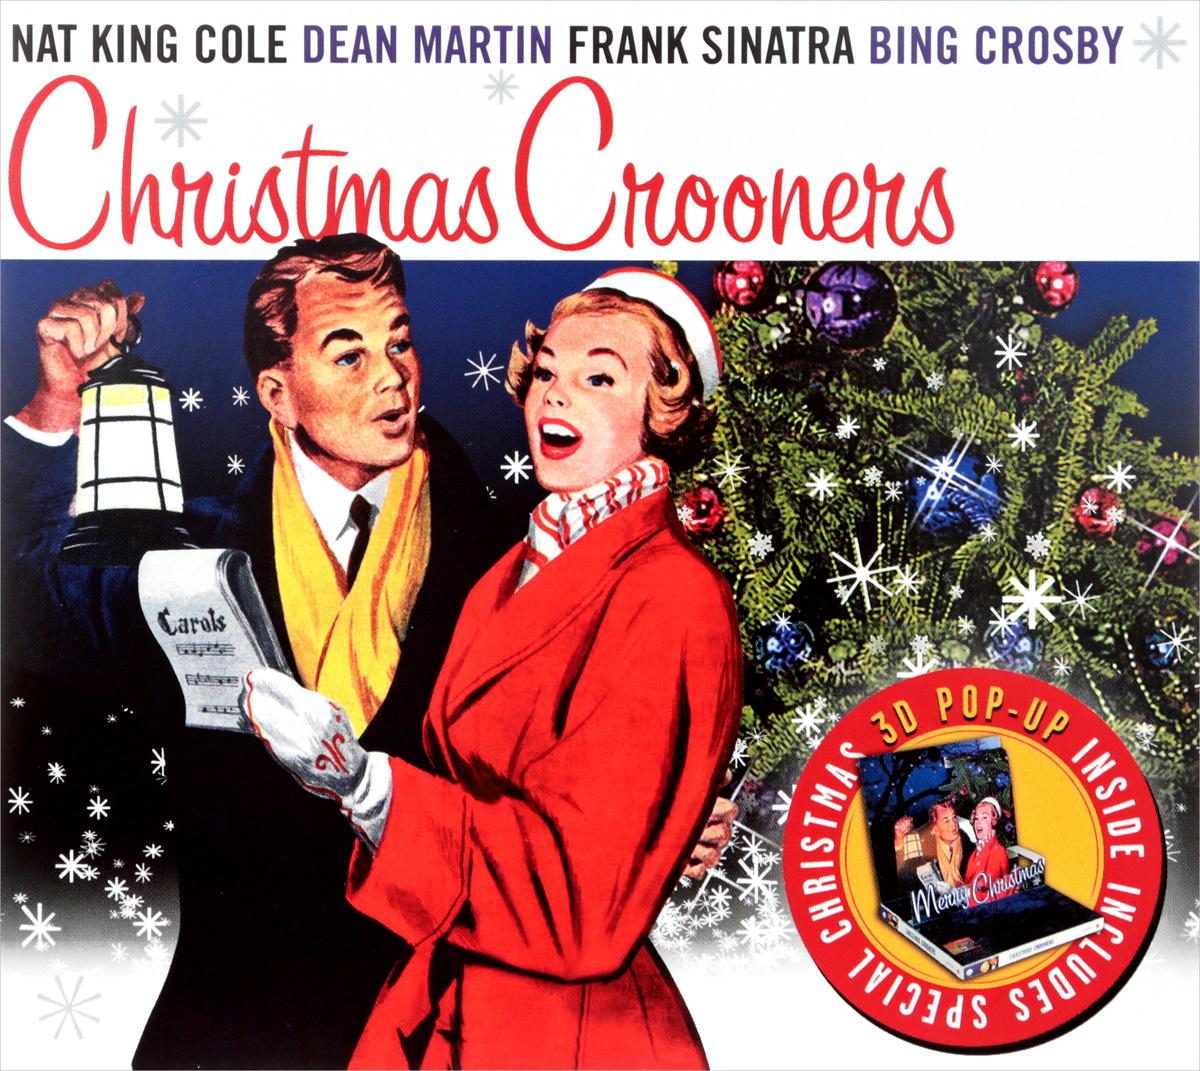 Christmas Crooners (3D Pop Up Sleeve) christmas crooners 3d pop up sleeve